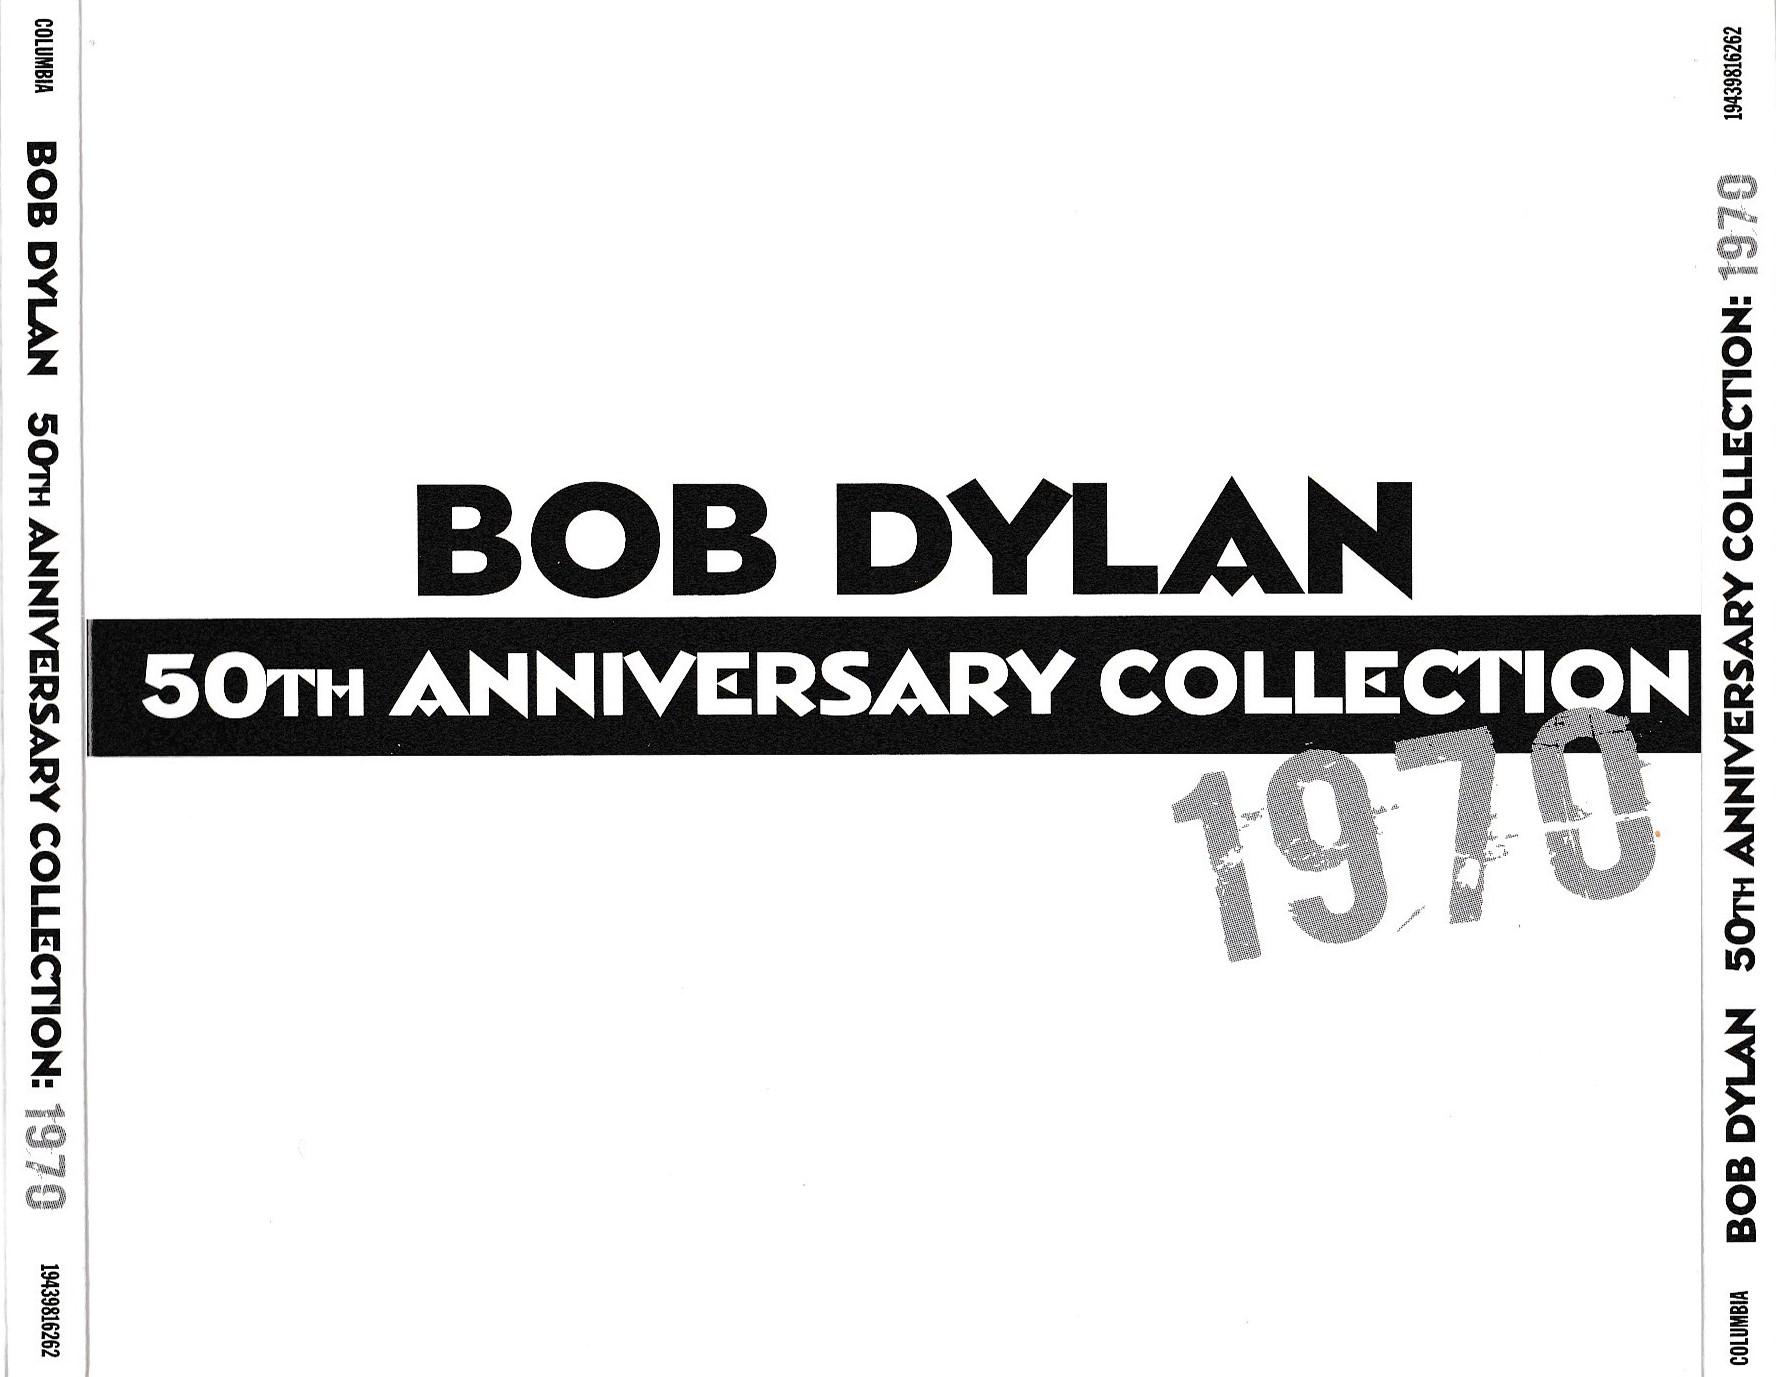 BobDylan50thAnniversary_1970.jpg